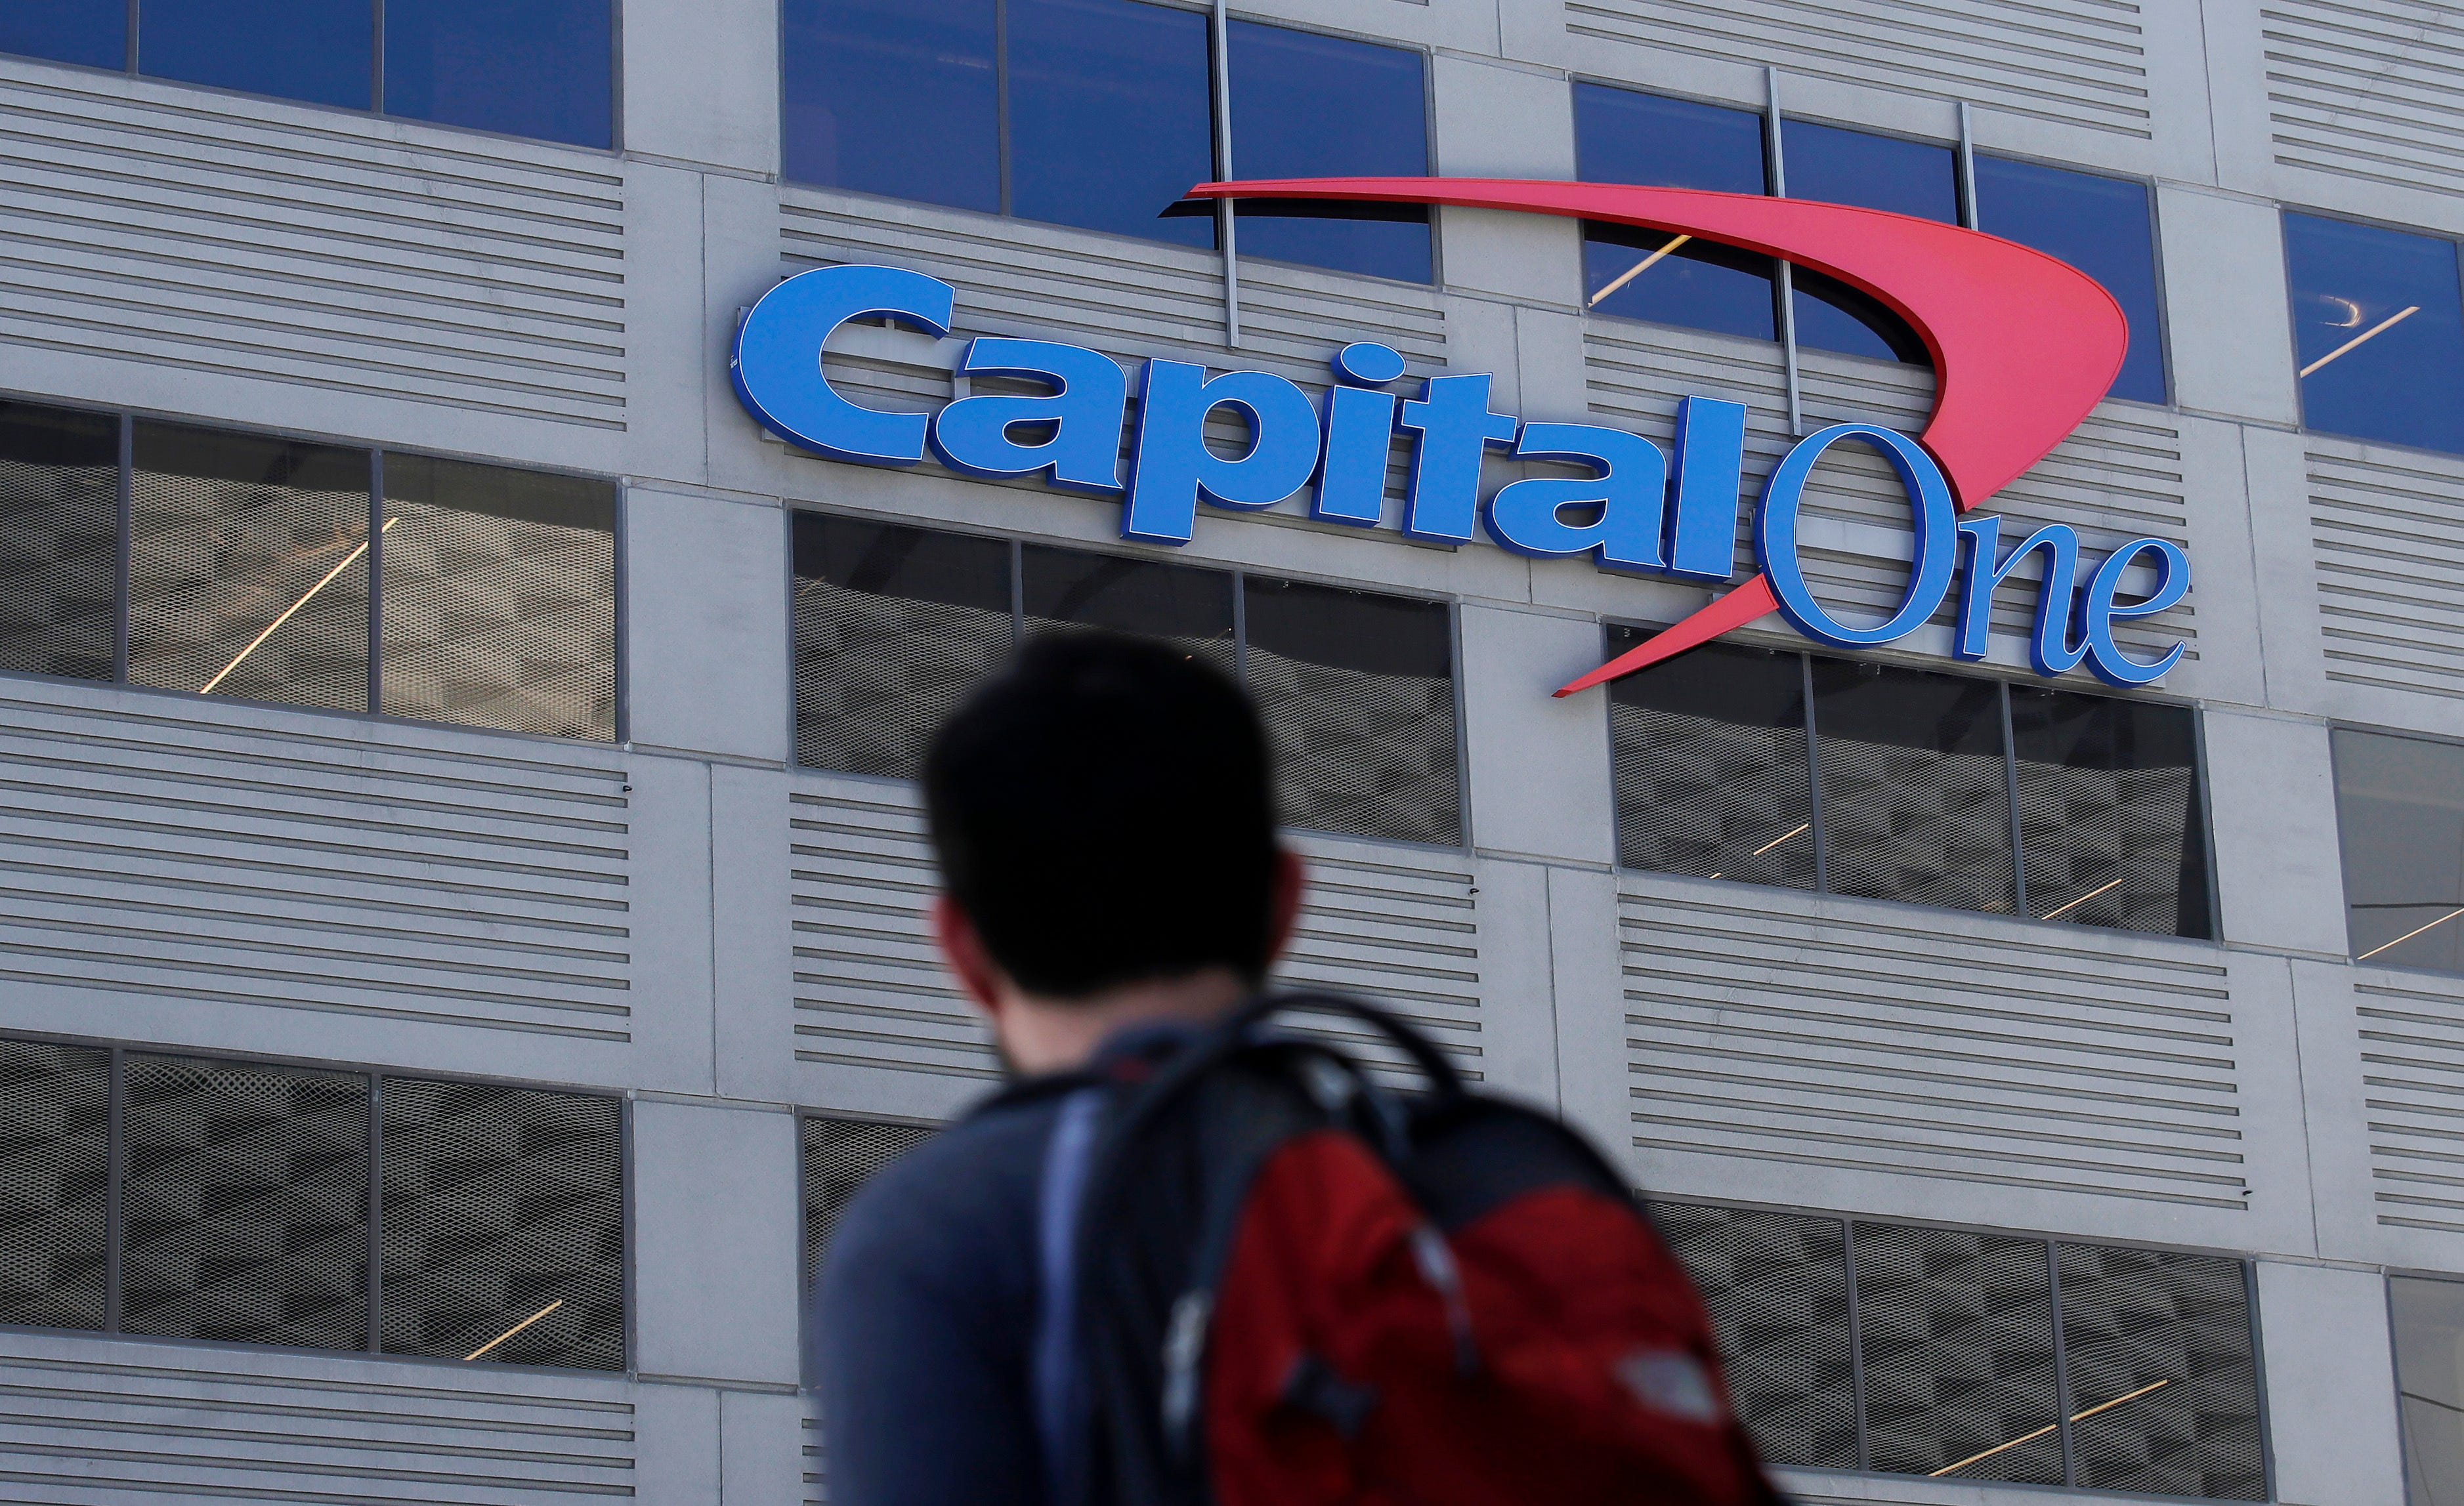 capital one secured credit card canada сколько квадратных метров занимает москва